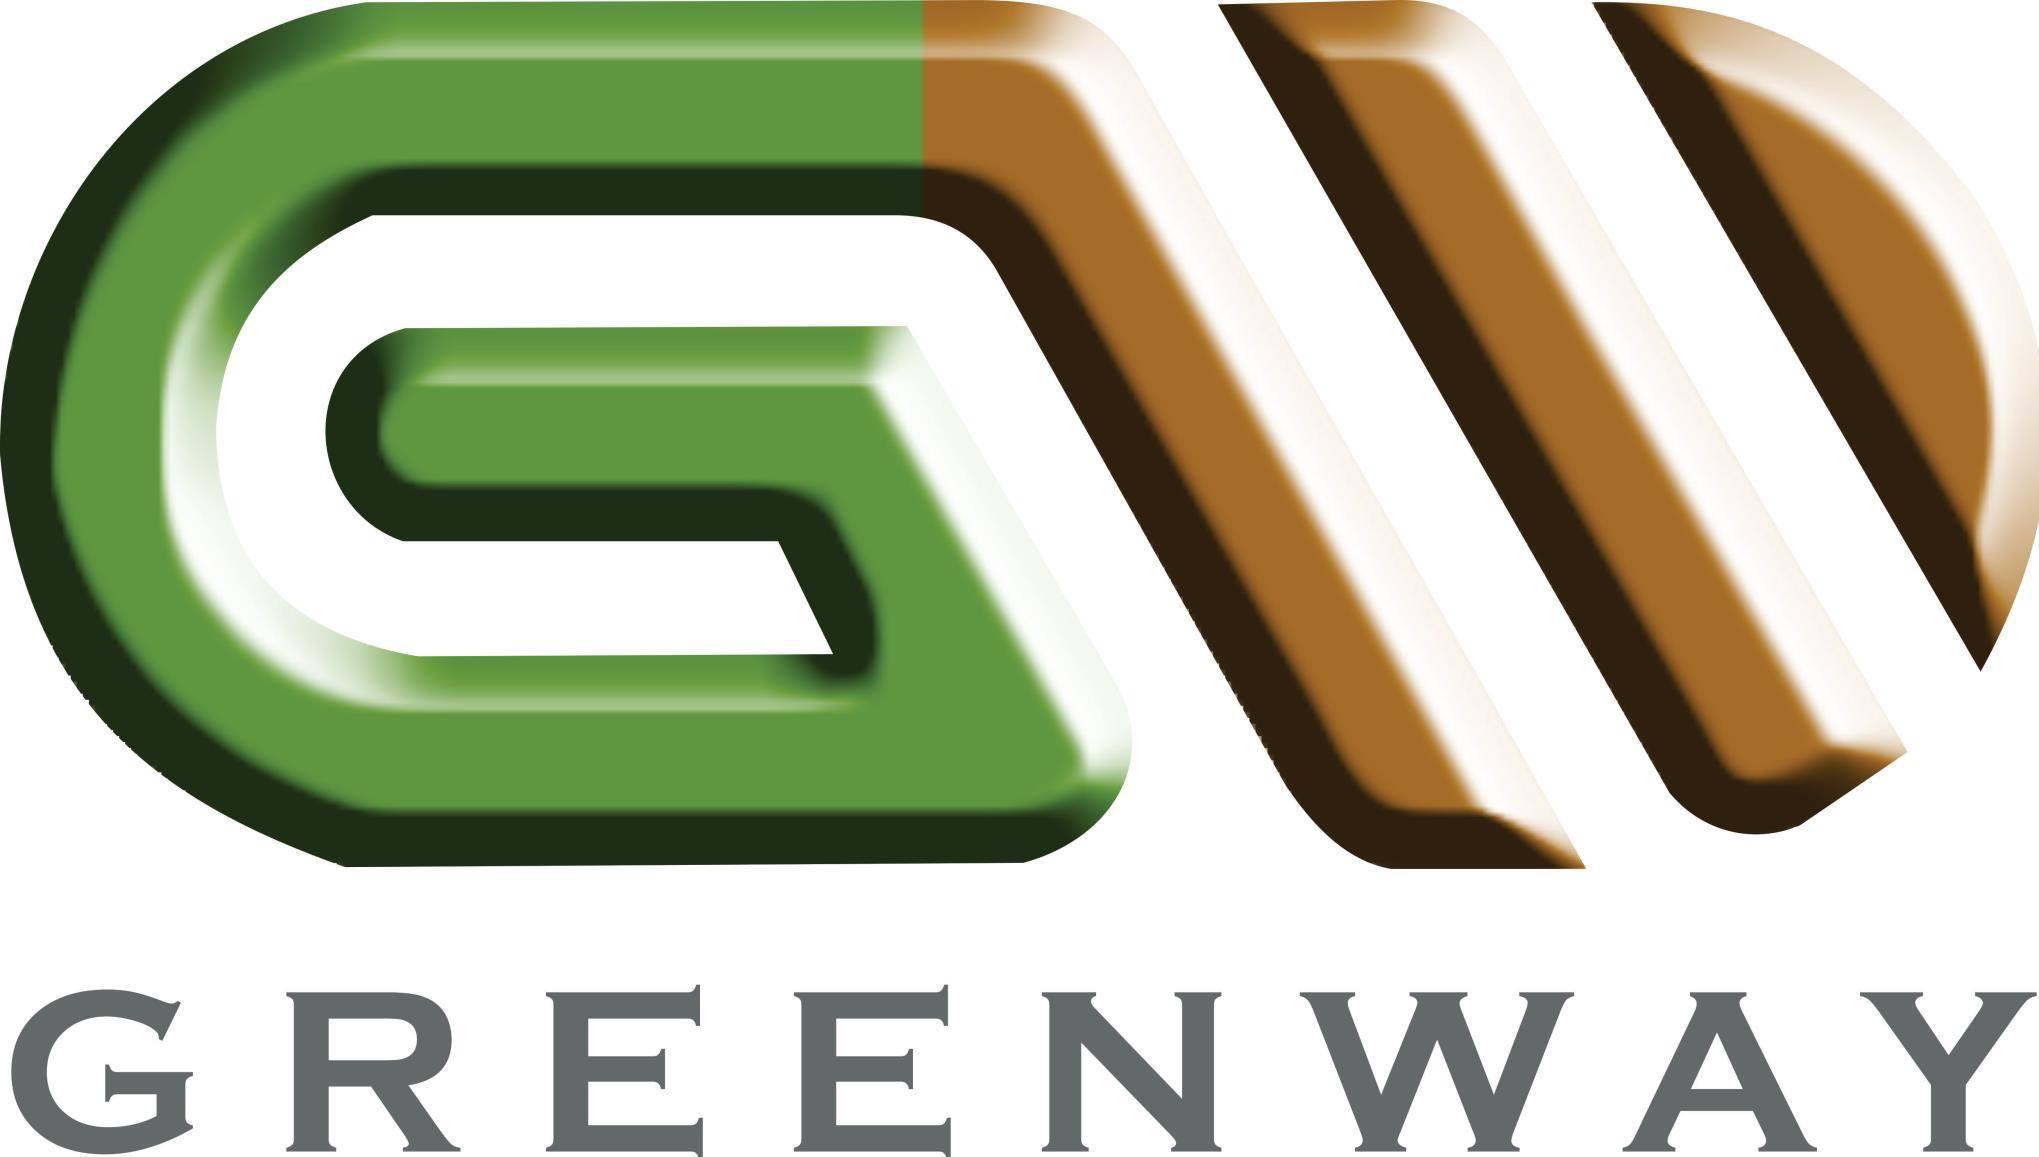 Greenway Enterprises Inc logo